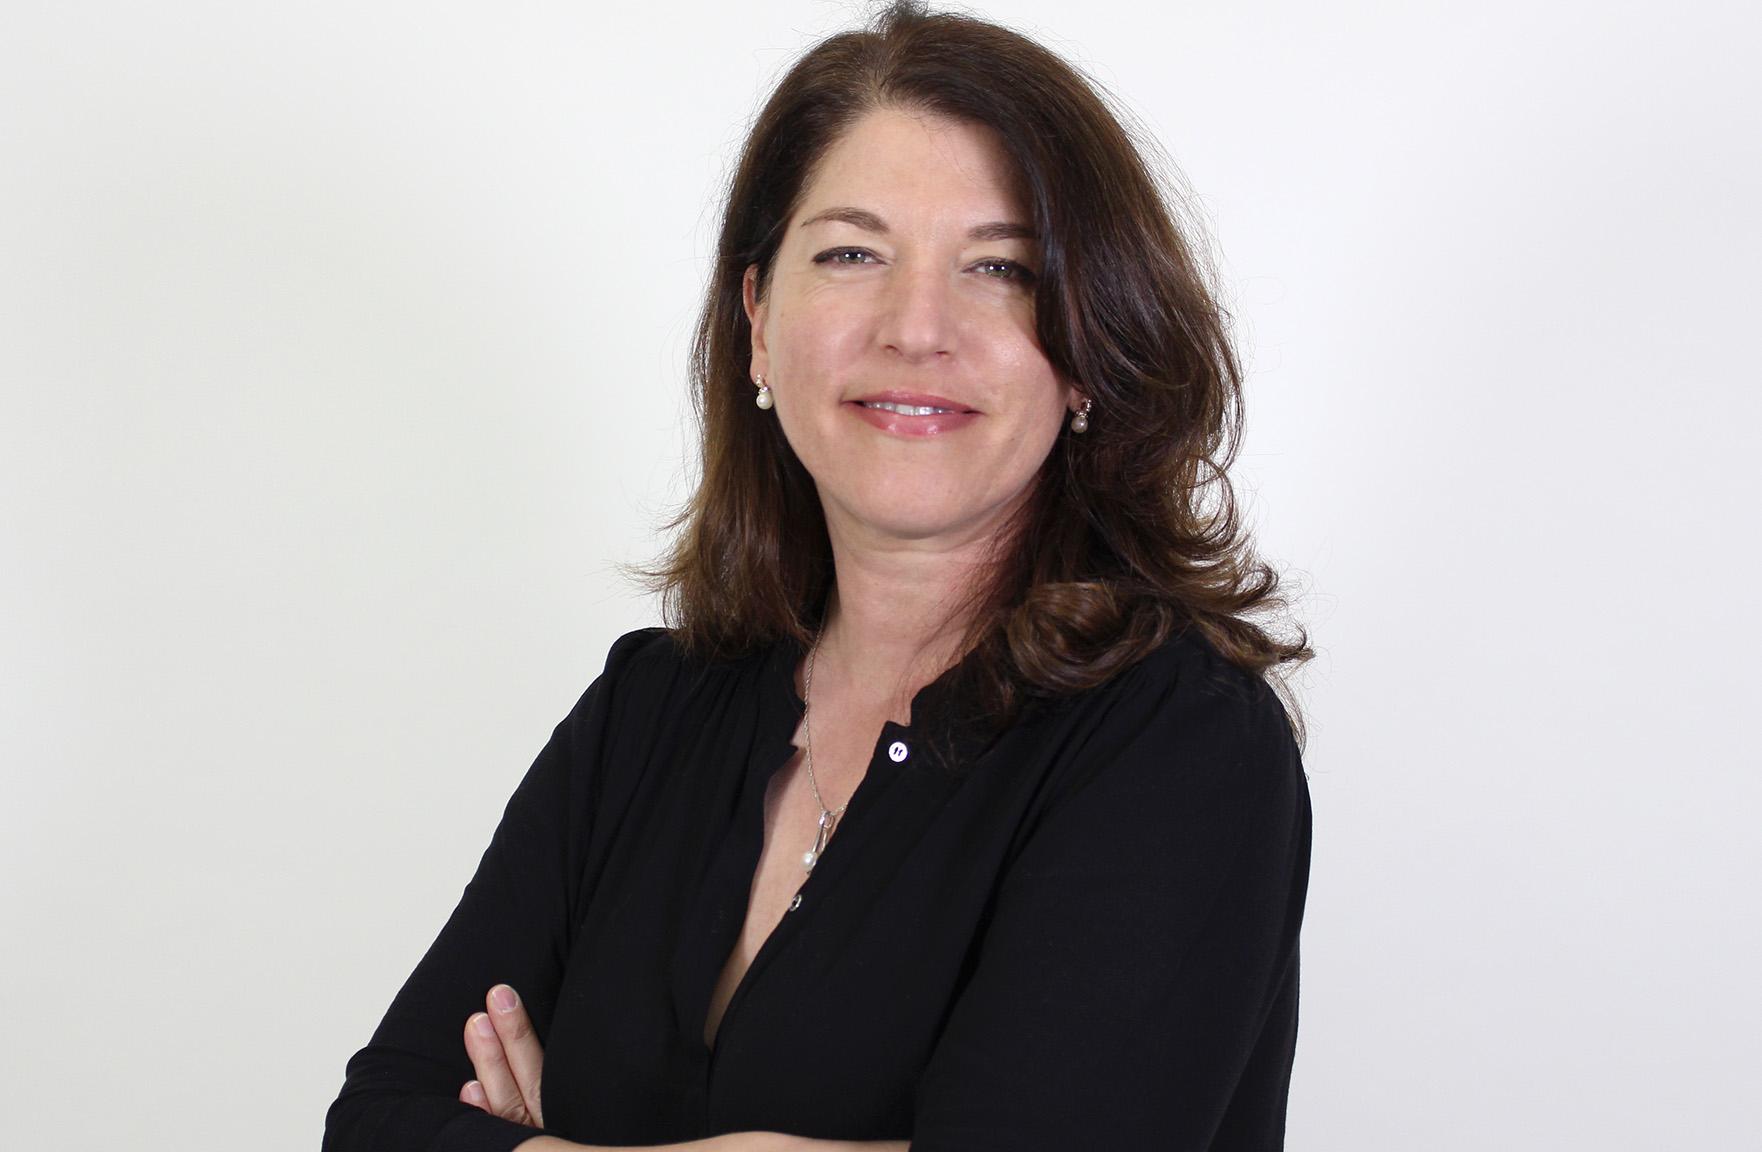 Paula Marcoux